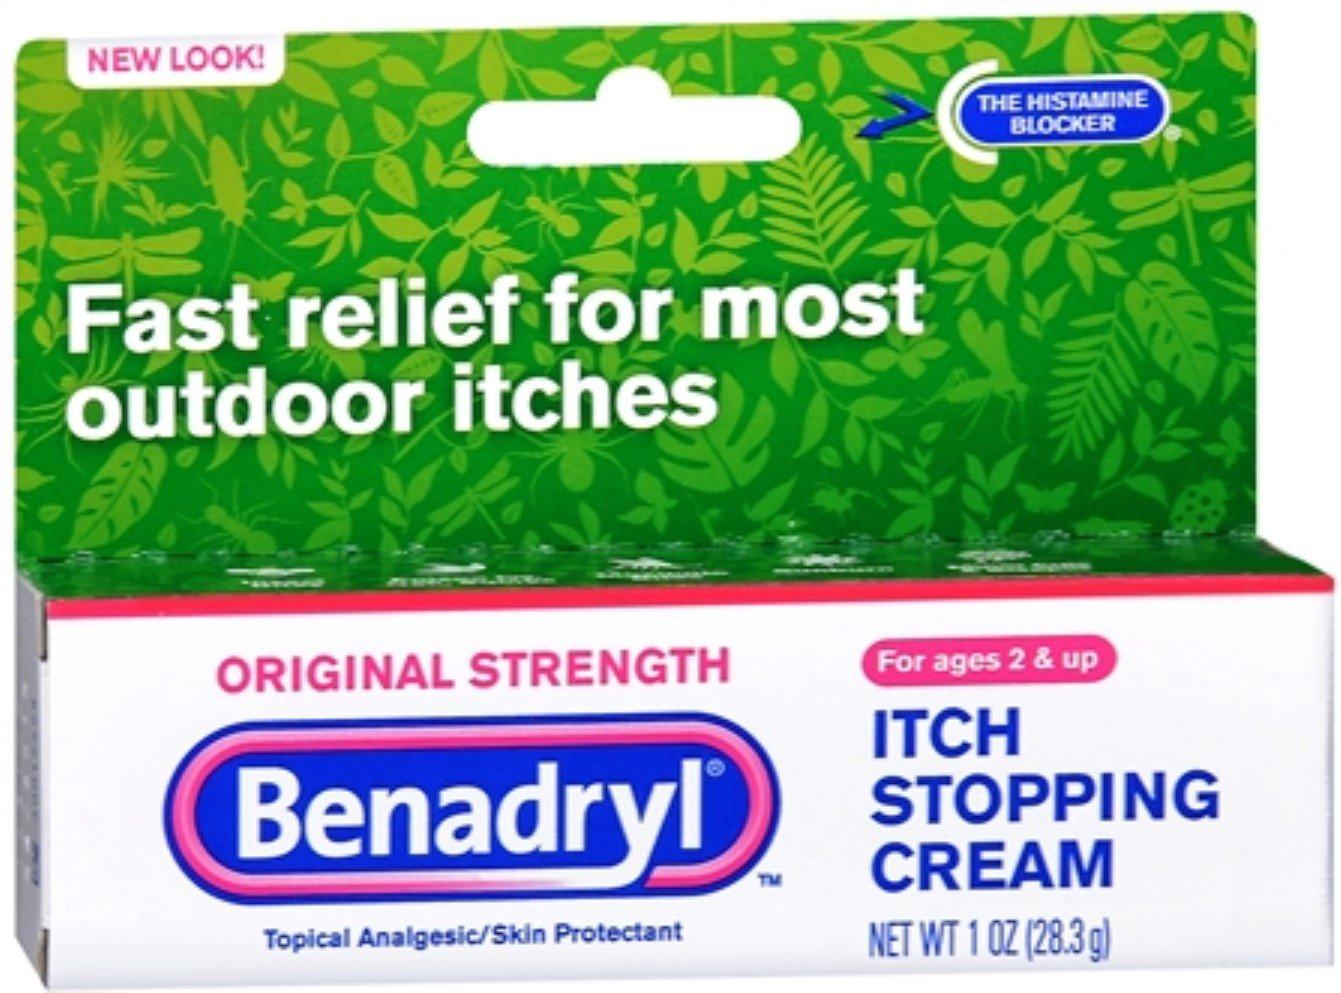 Benadryl Itch Stopping Cream Original Strength 1 oz (Pack of 9)